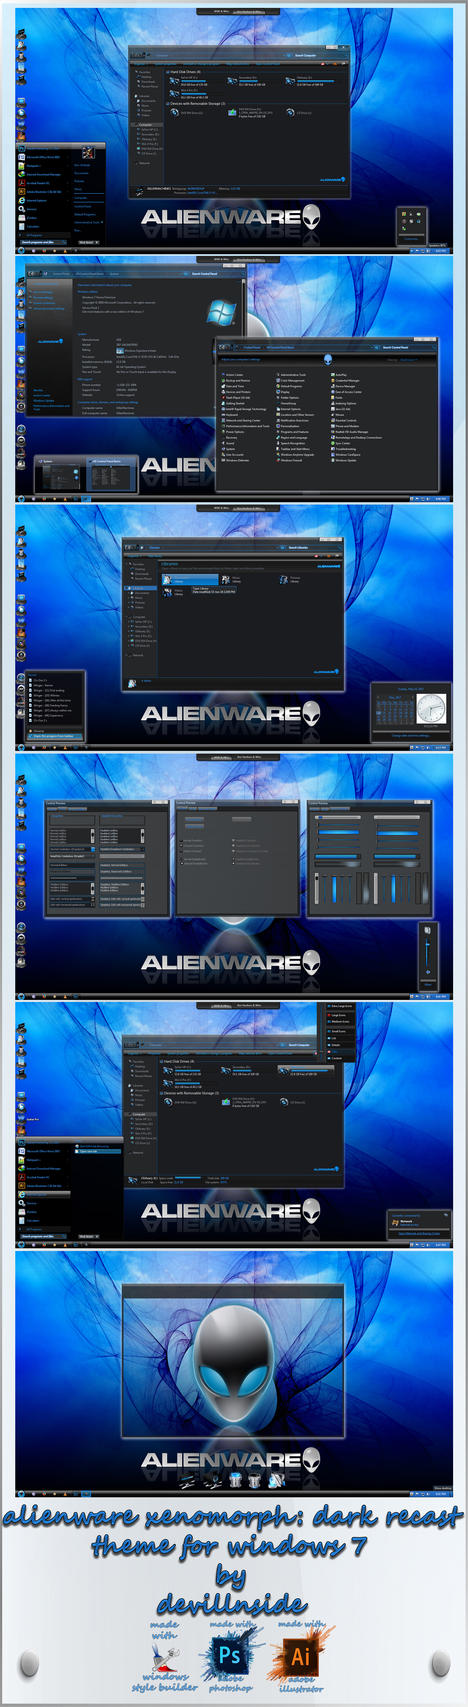 Alienware Xenomorph: Dark Recast by devillnside